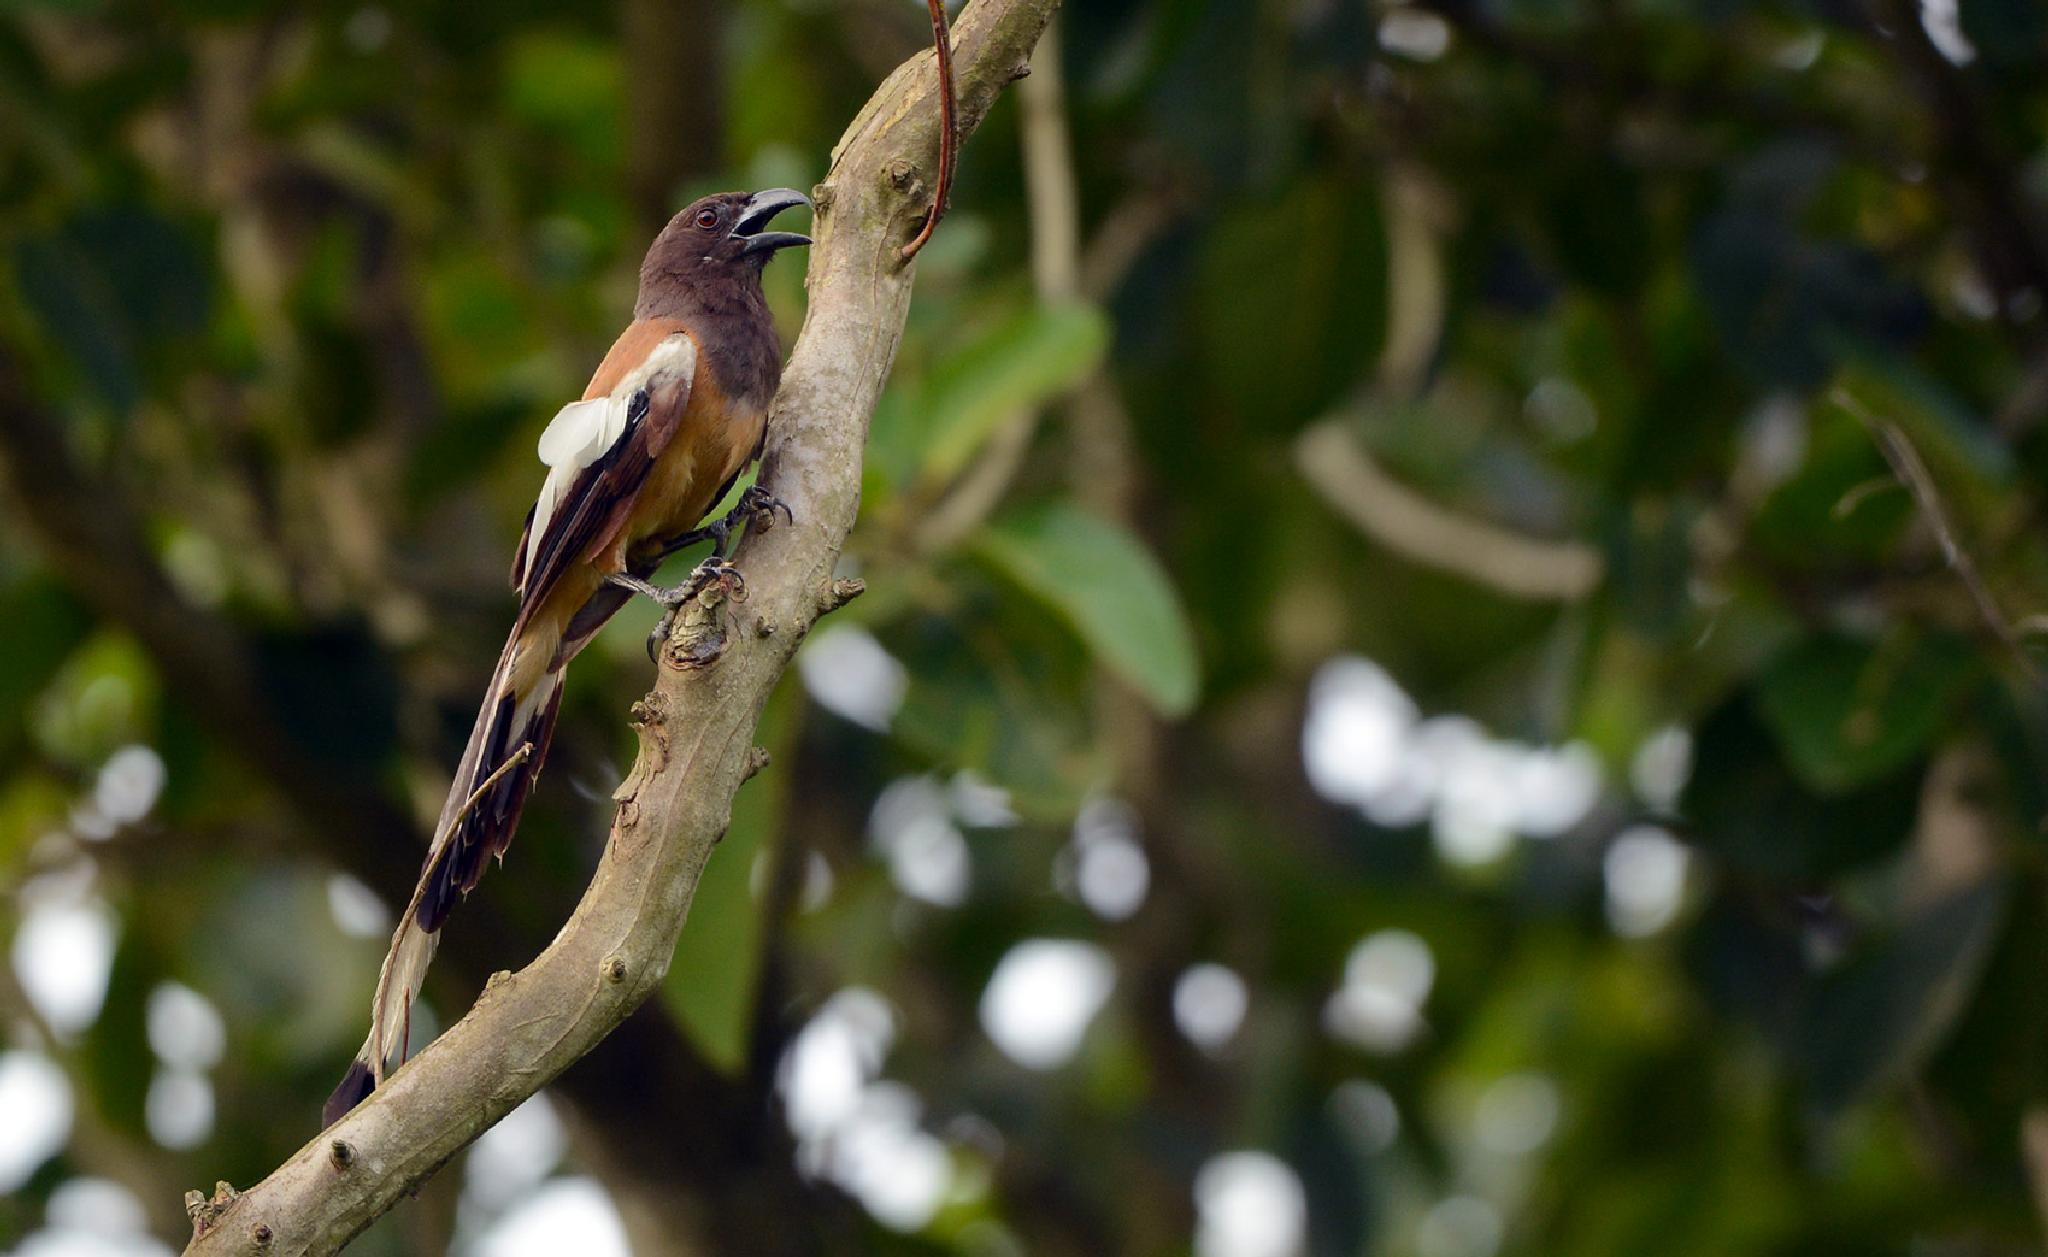 Rufous treepie by Maroof Rana